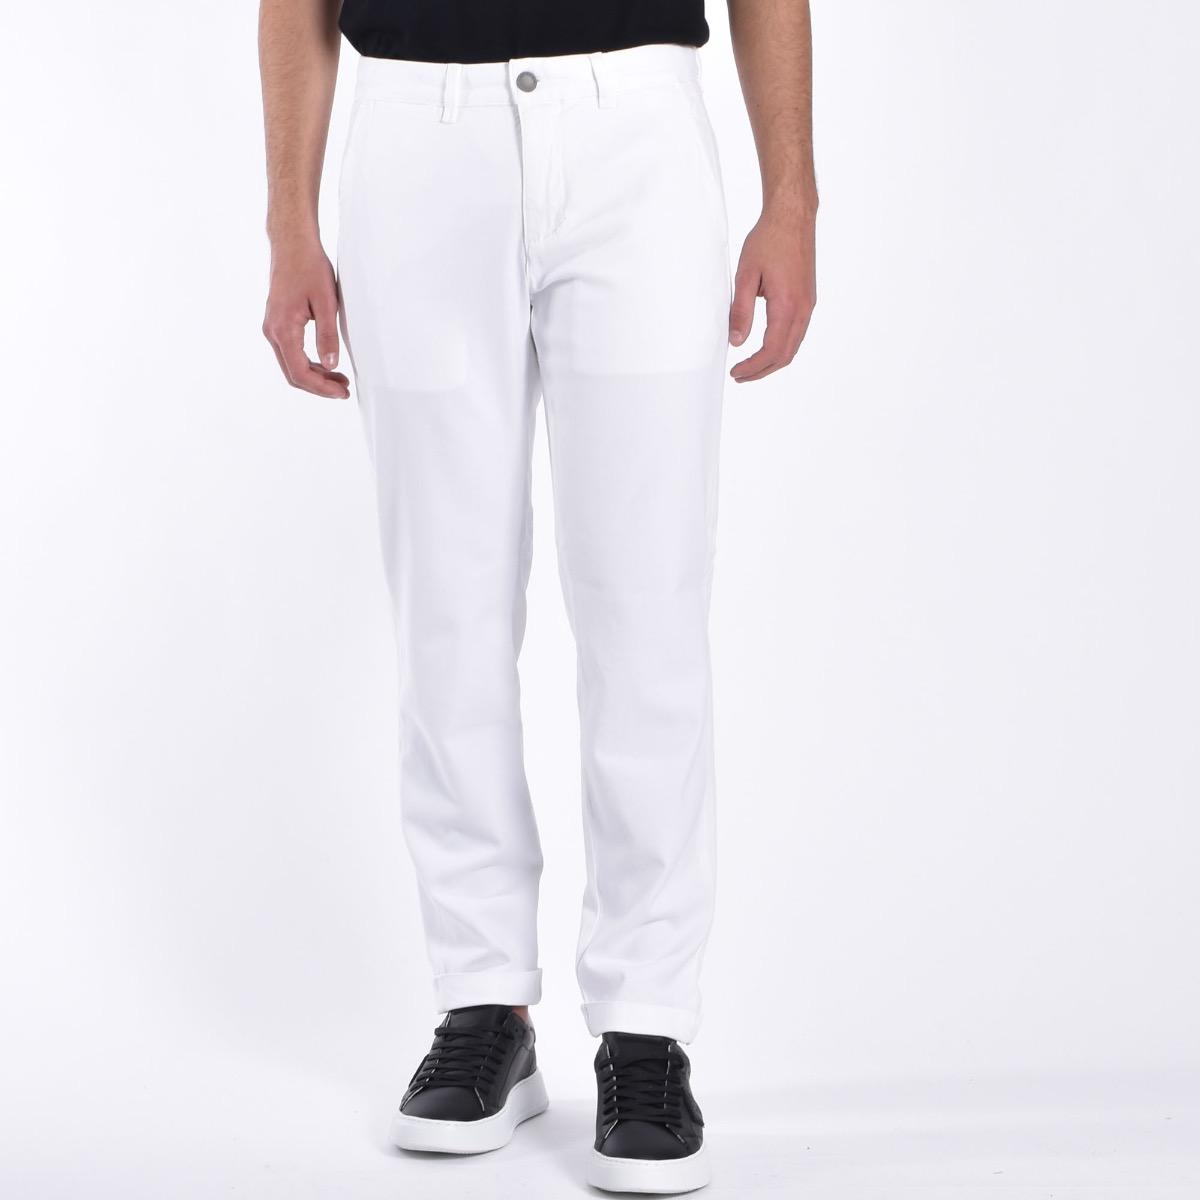 Pantalone tasca americana basico - Bianco